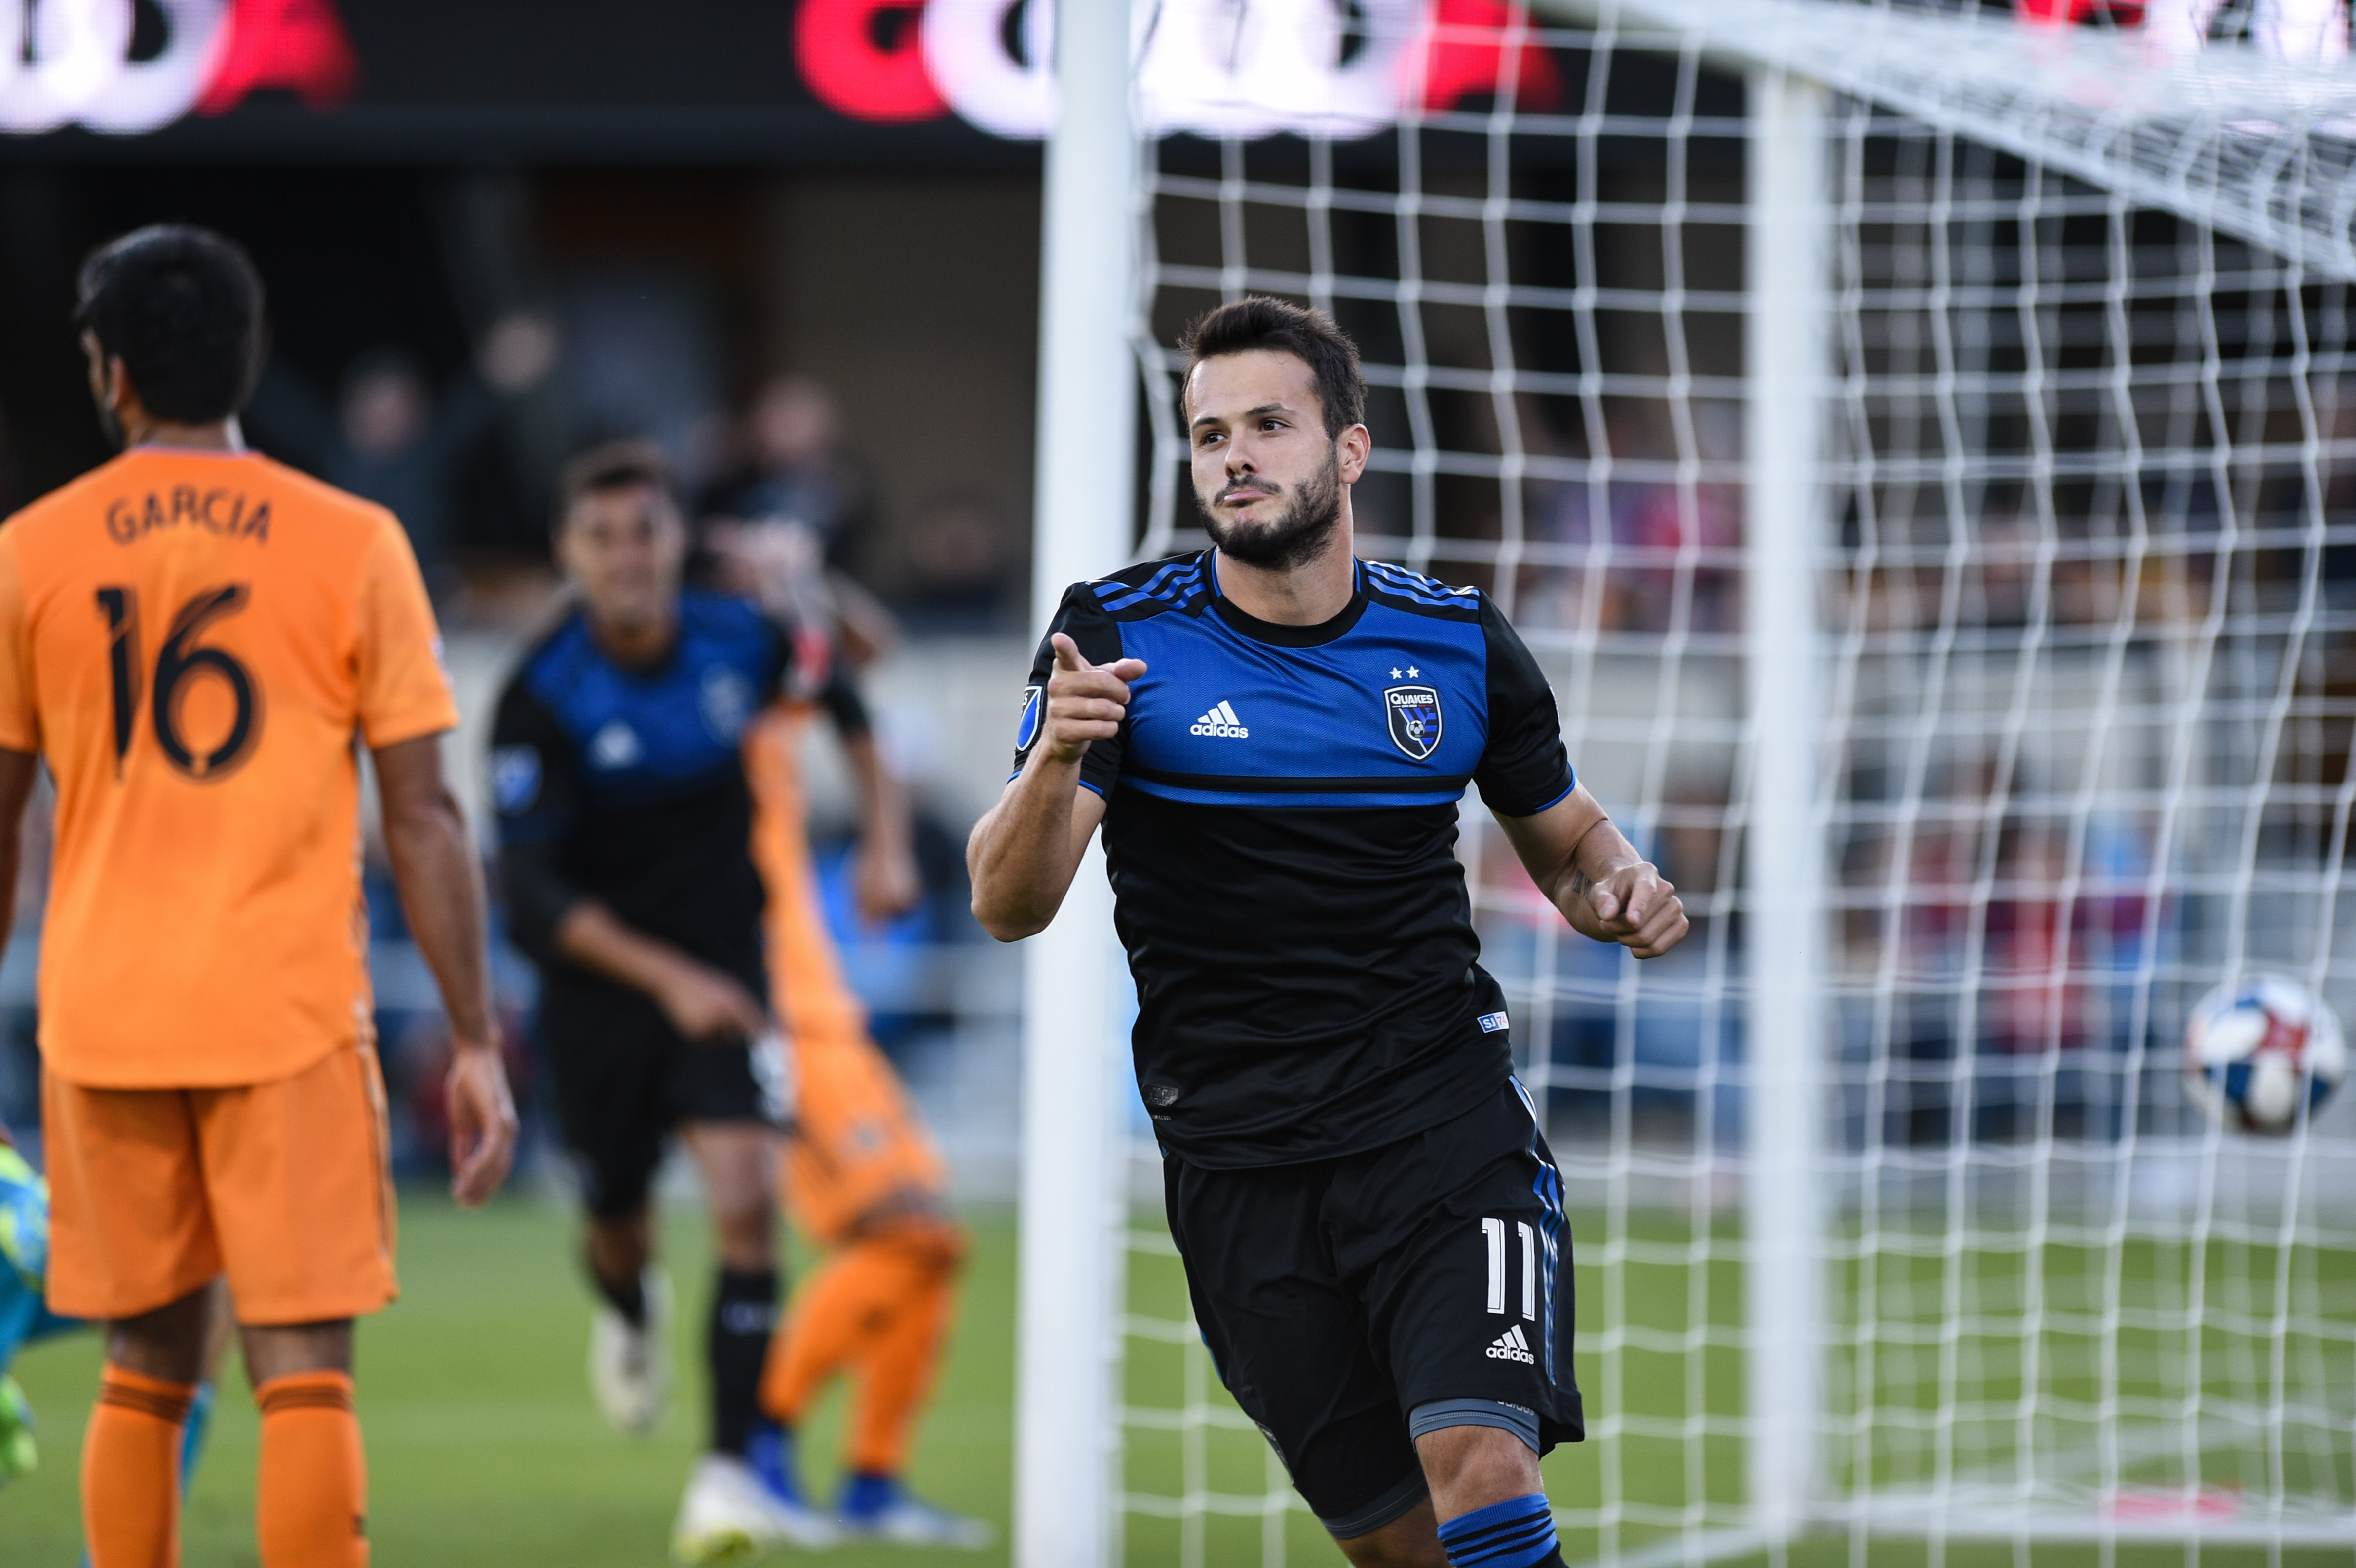 SOCCER: JUN 26 MLS - Houston Dynamo at San Jose Earthquakes